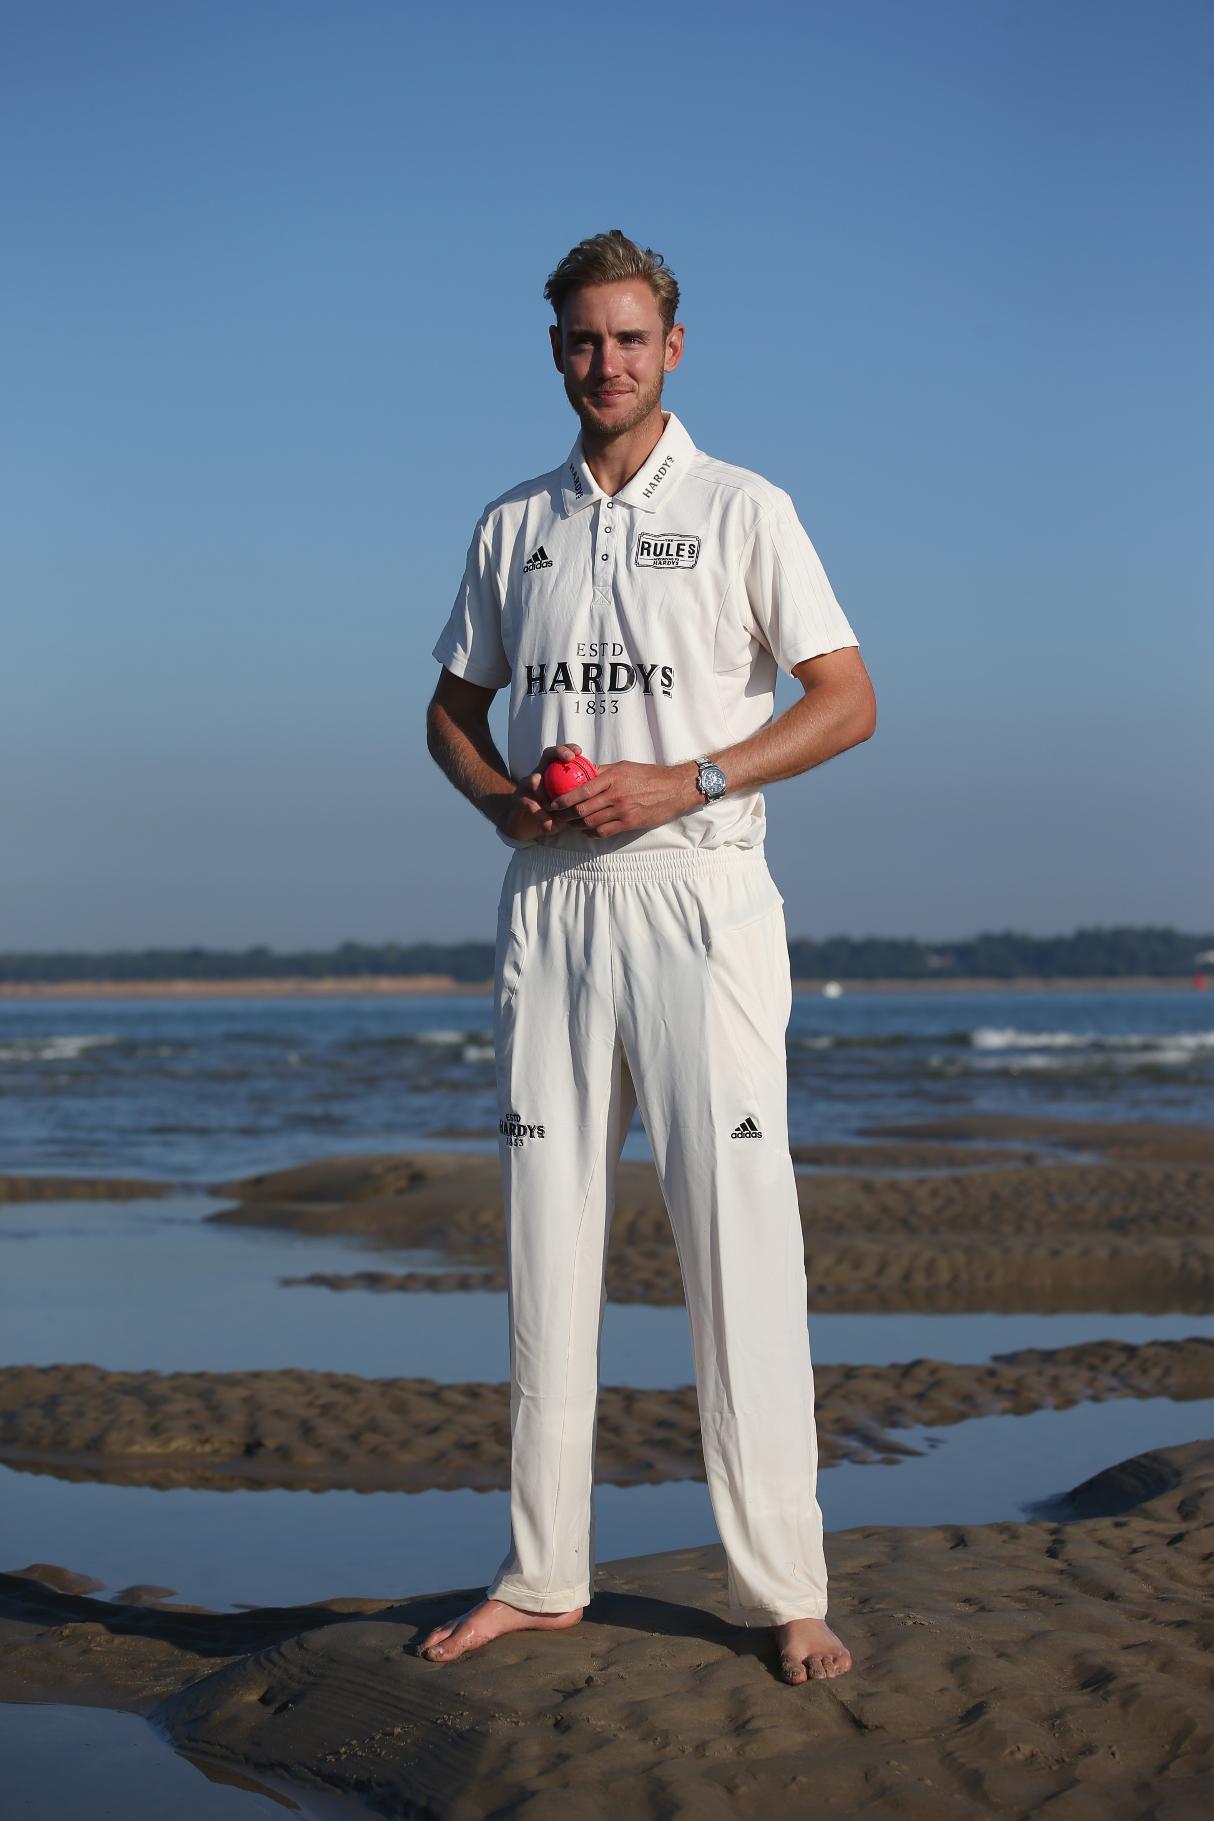 stuart-broad-interview-hardys-bramble-bank-cricket-match-3